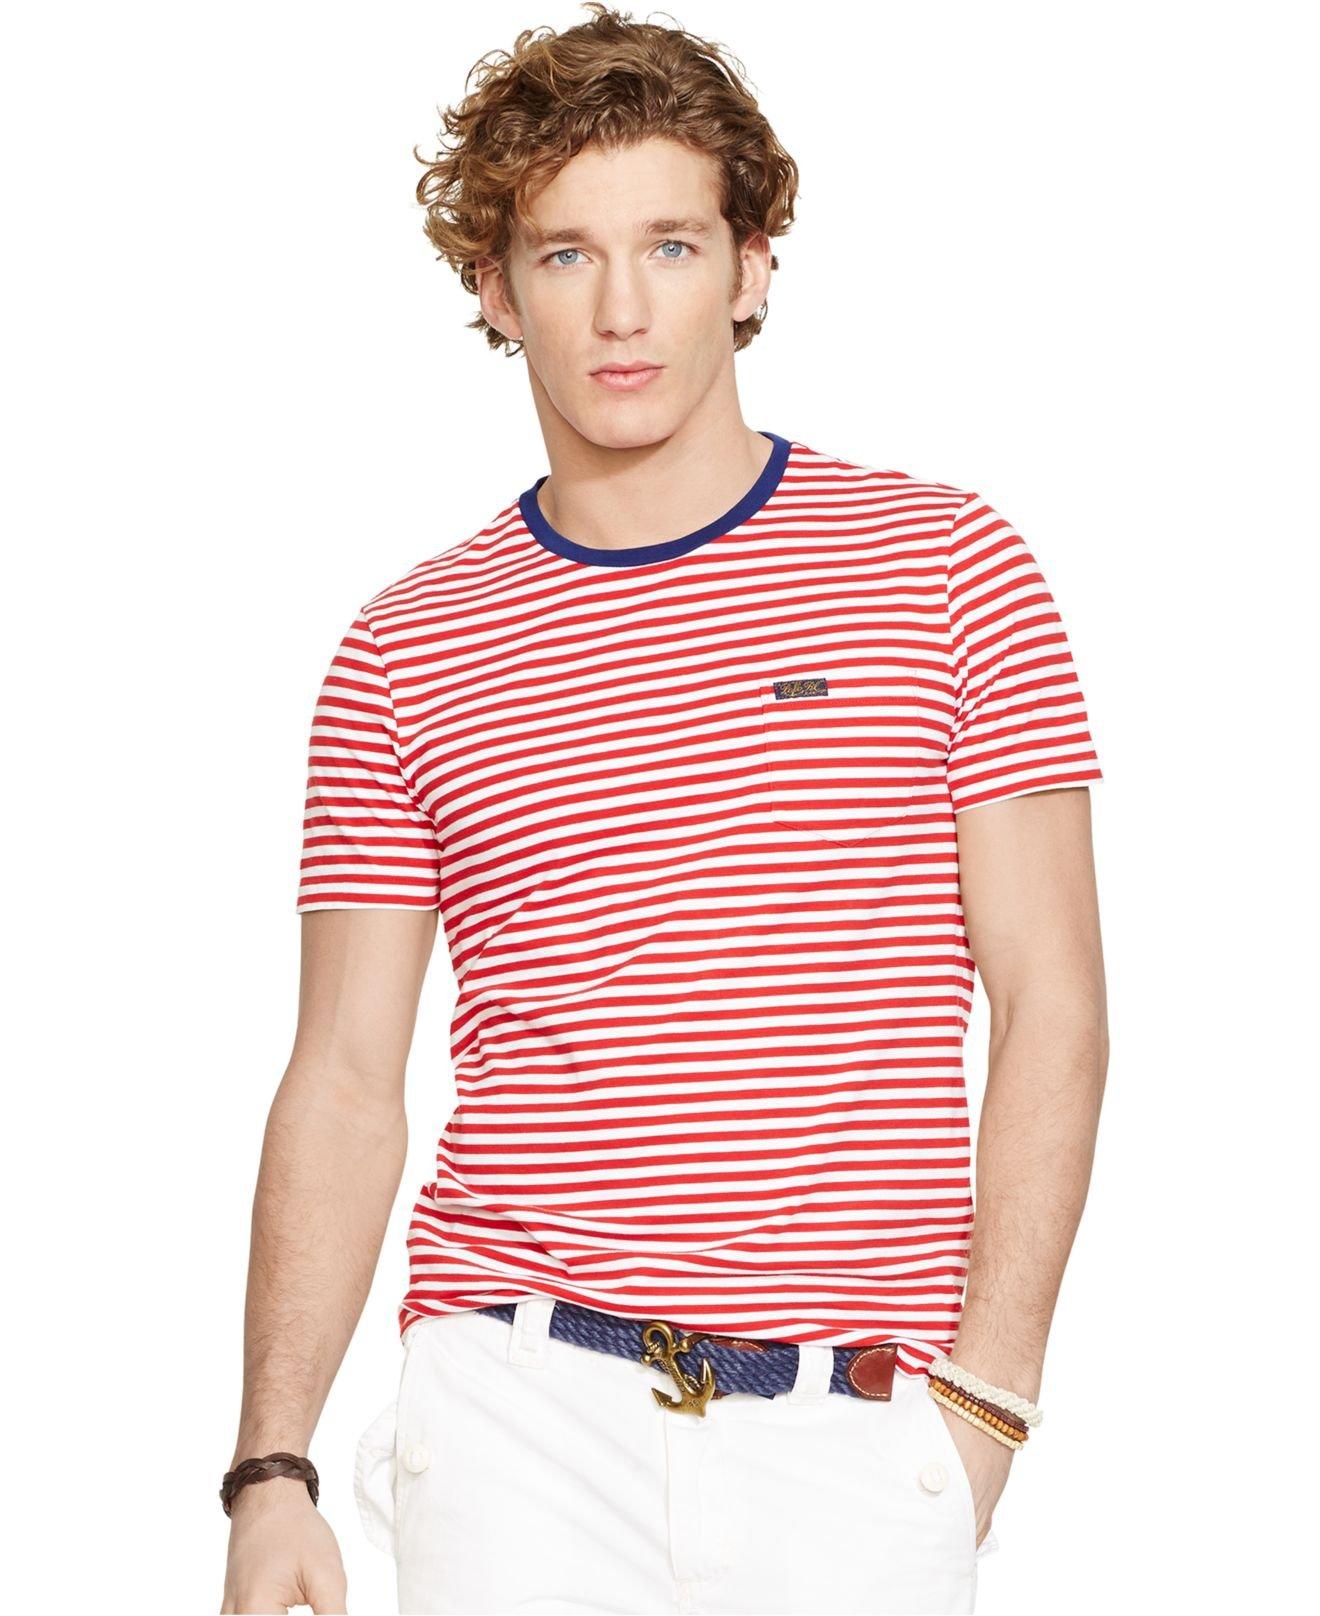 1193ec965c71 Lyst - Polo Ralph Lauren Striped Pocket T-Shirt in Red for Men